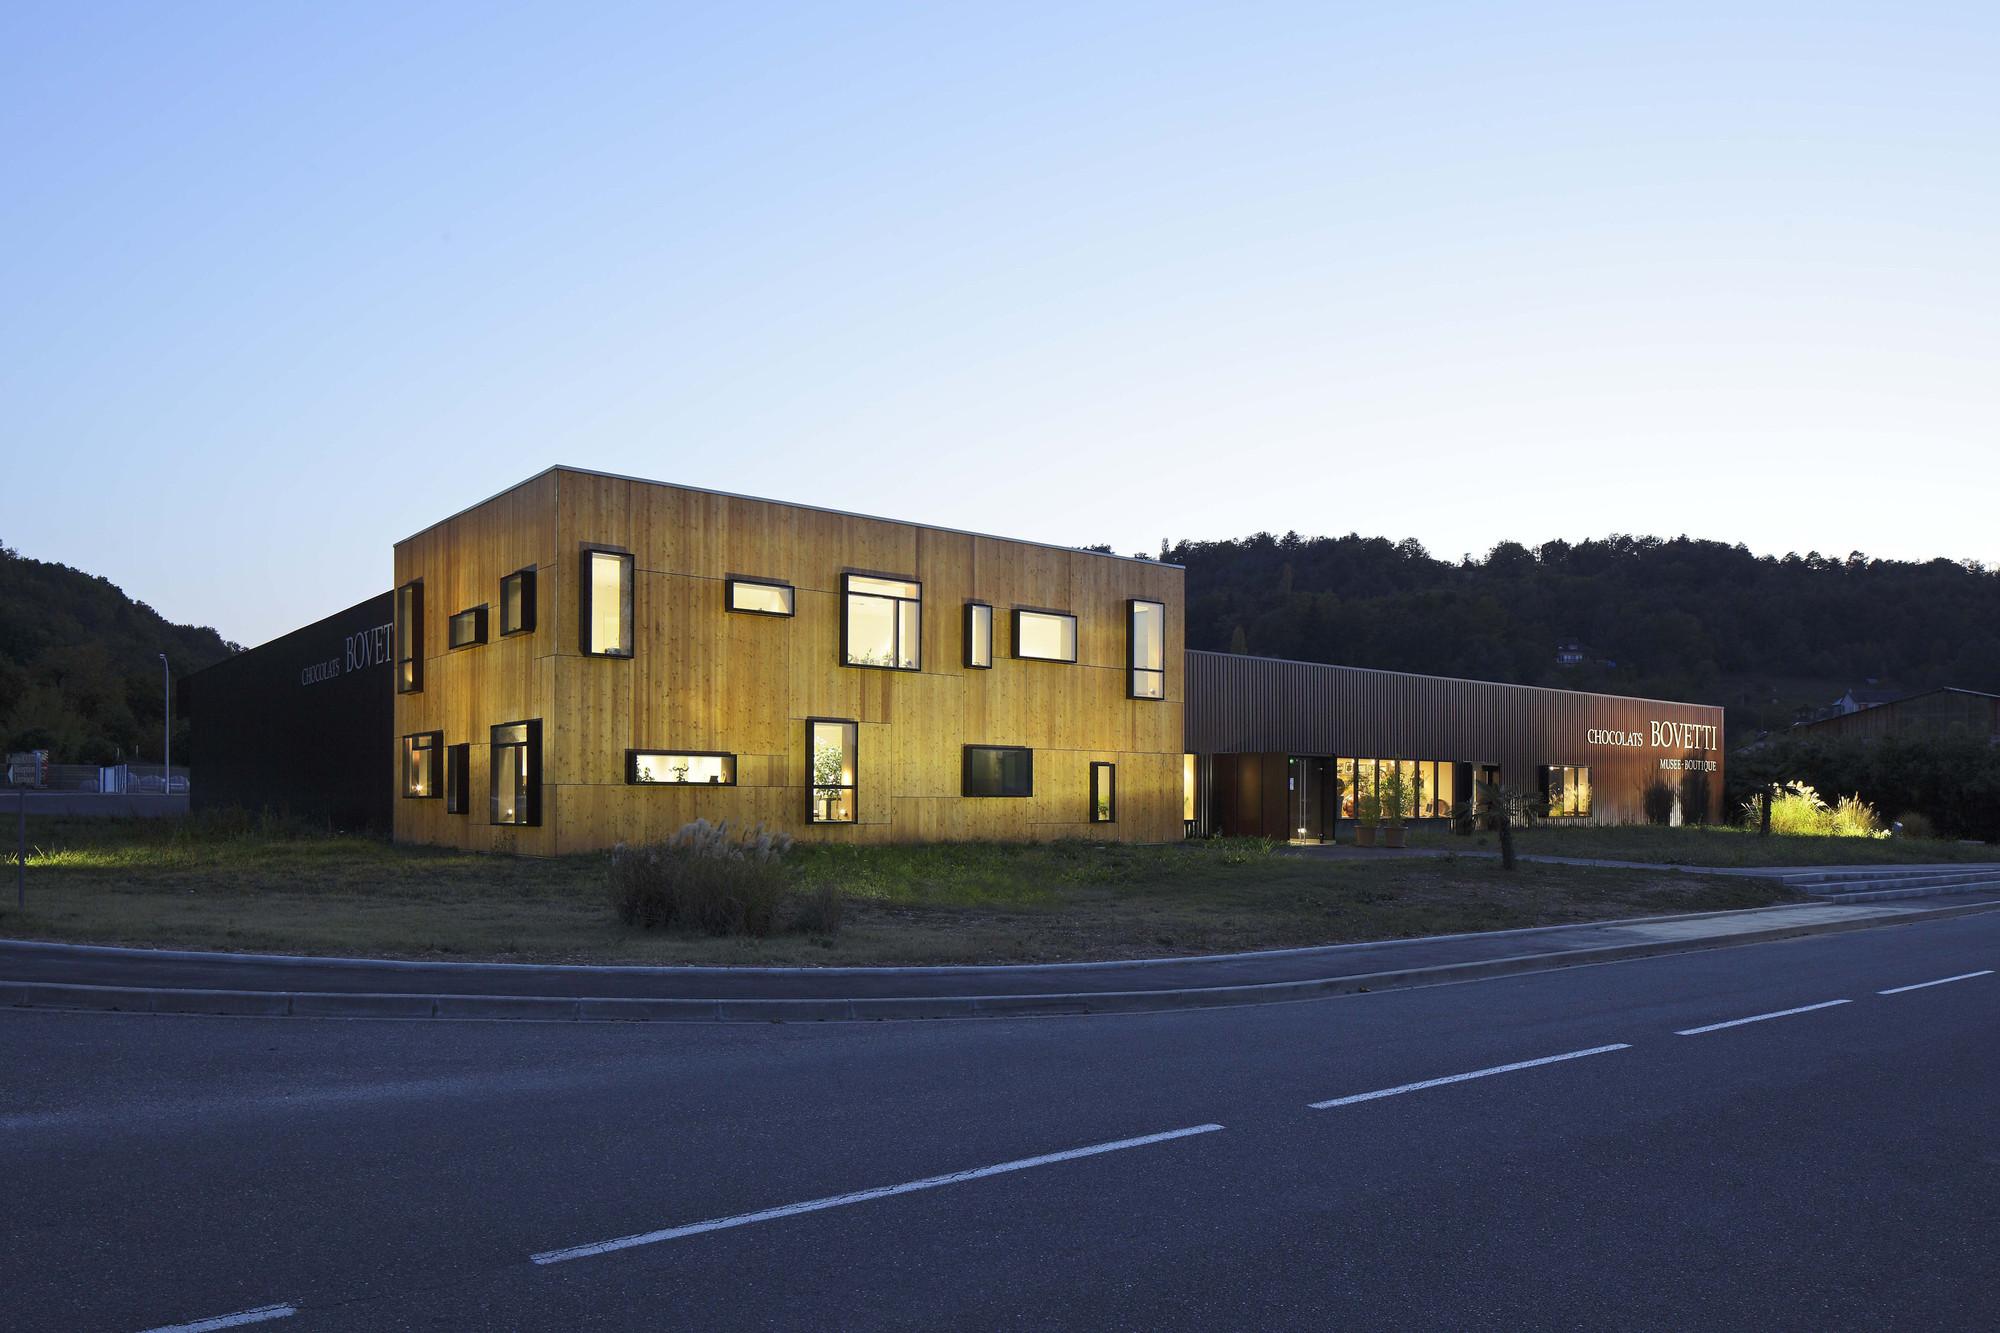 Chocolaterie Bovetti / CA/PA Architectes, Courtesy of CA/PA Architectes